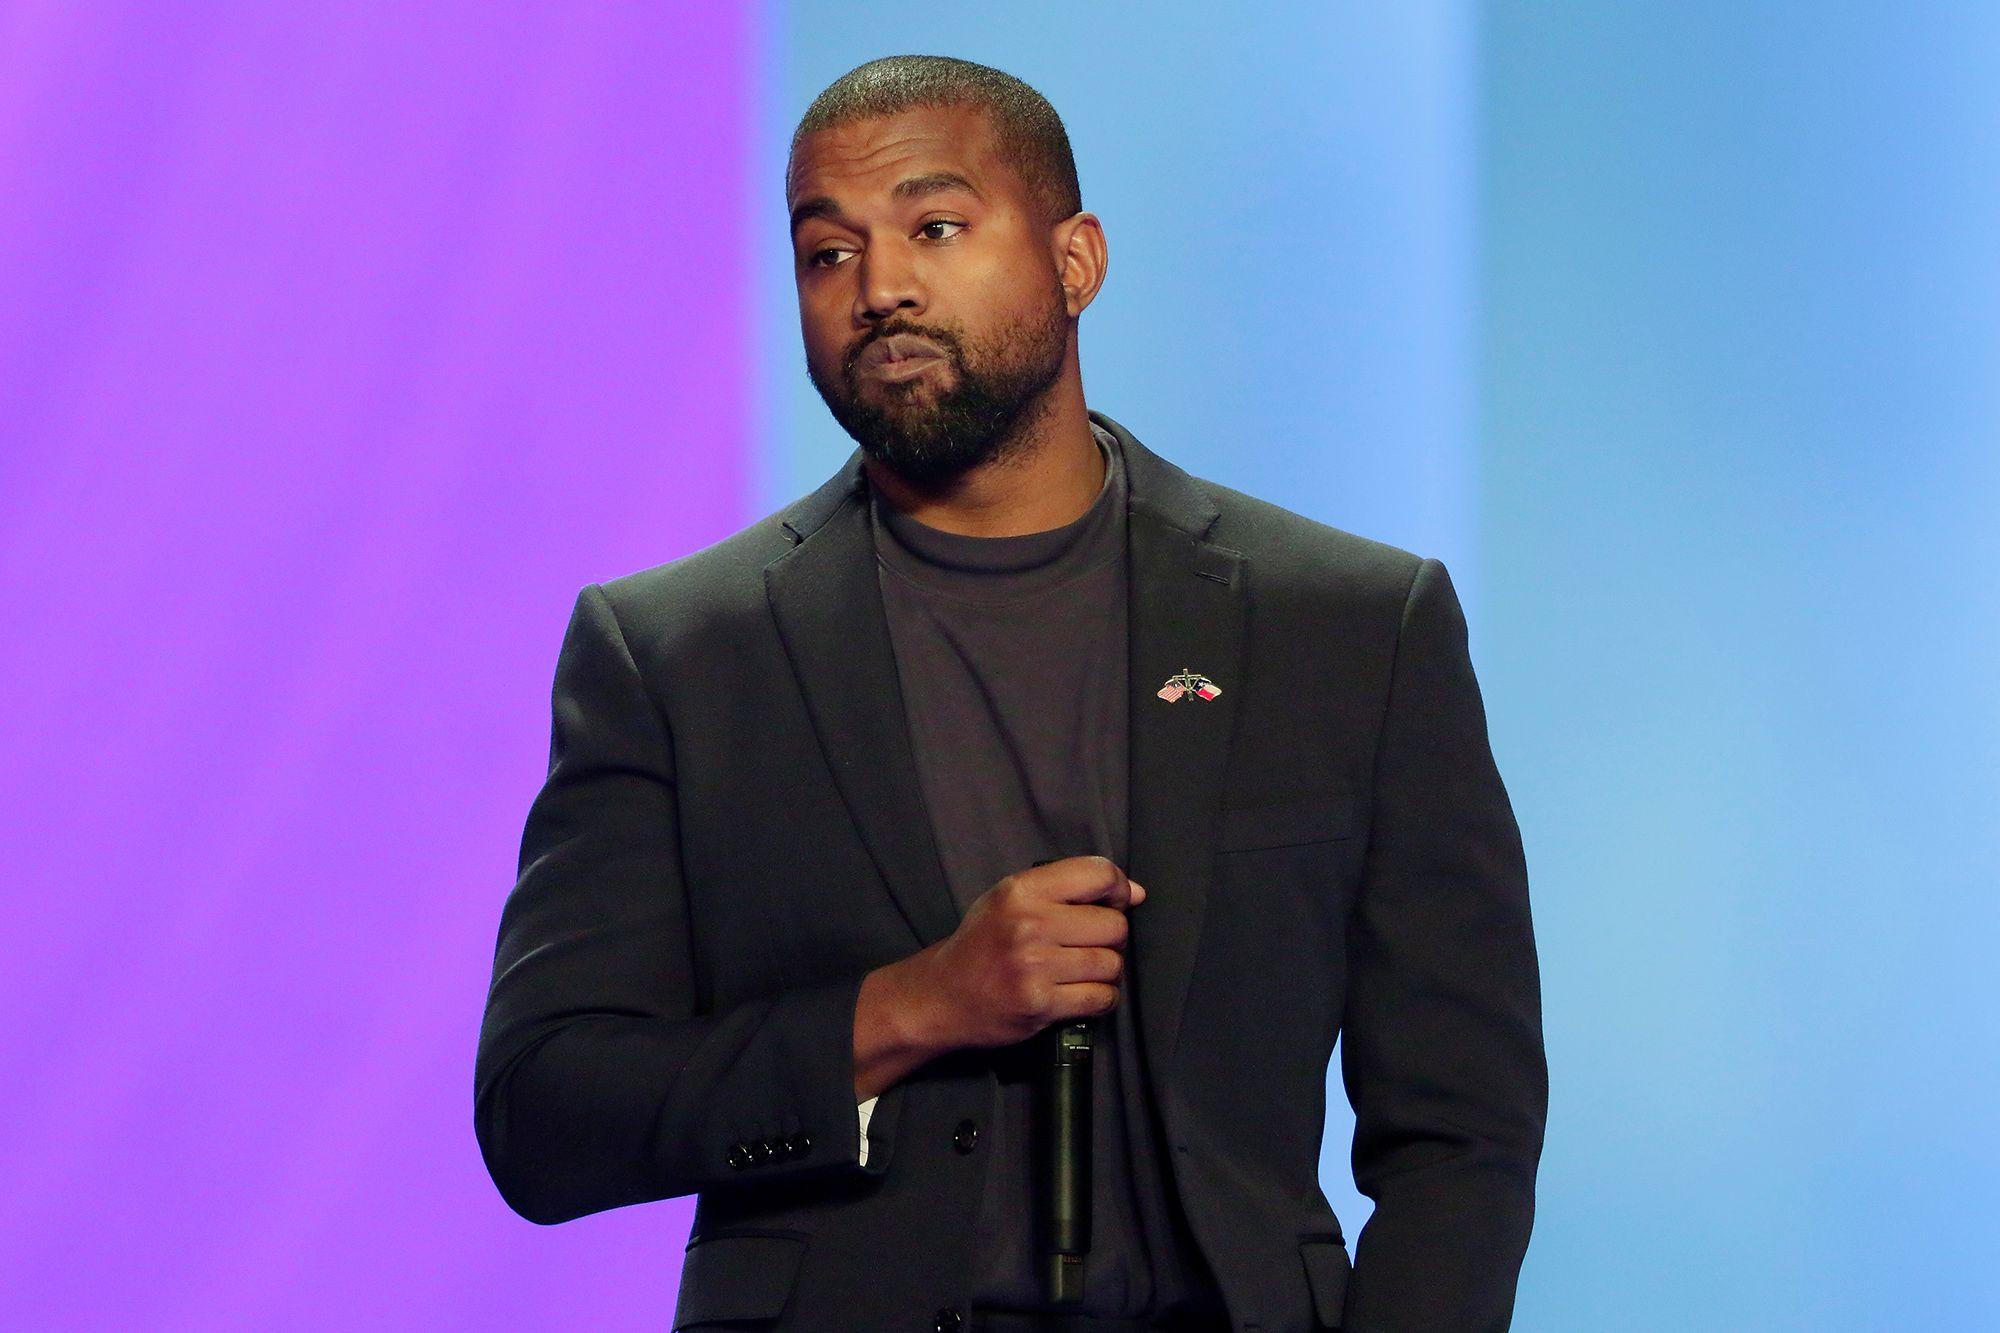 O Kanye West συγκέντρωσε 60.000 ψήφους στις προεδρικές εκλογές των ΗΠΑ!